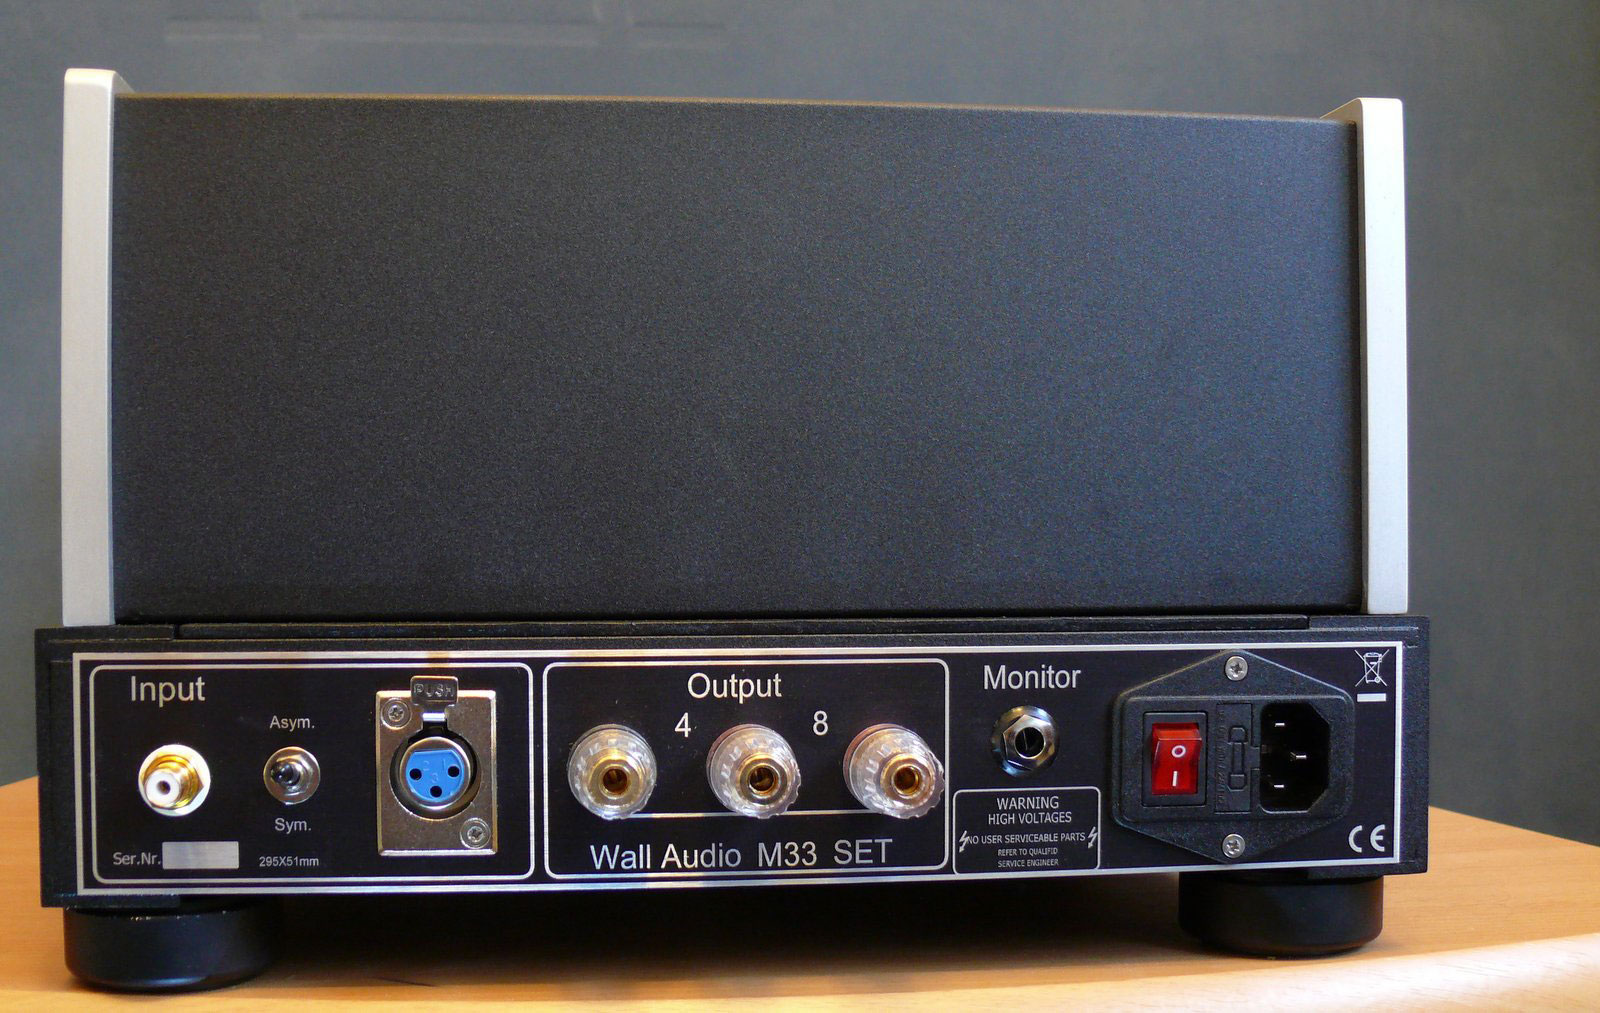 Wall Audio M 33 SET